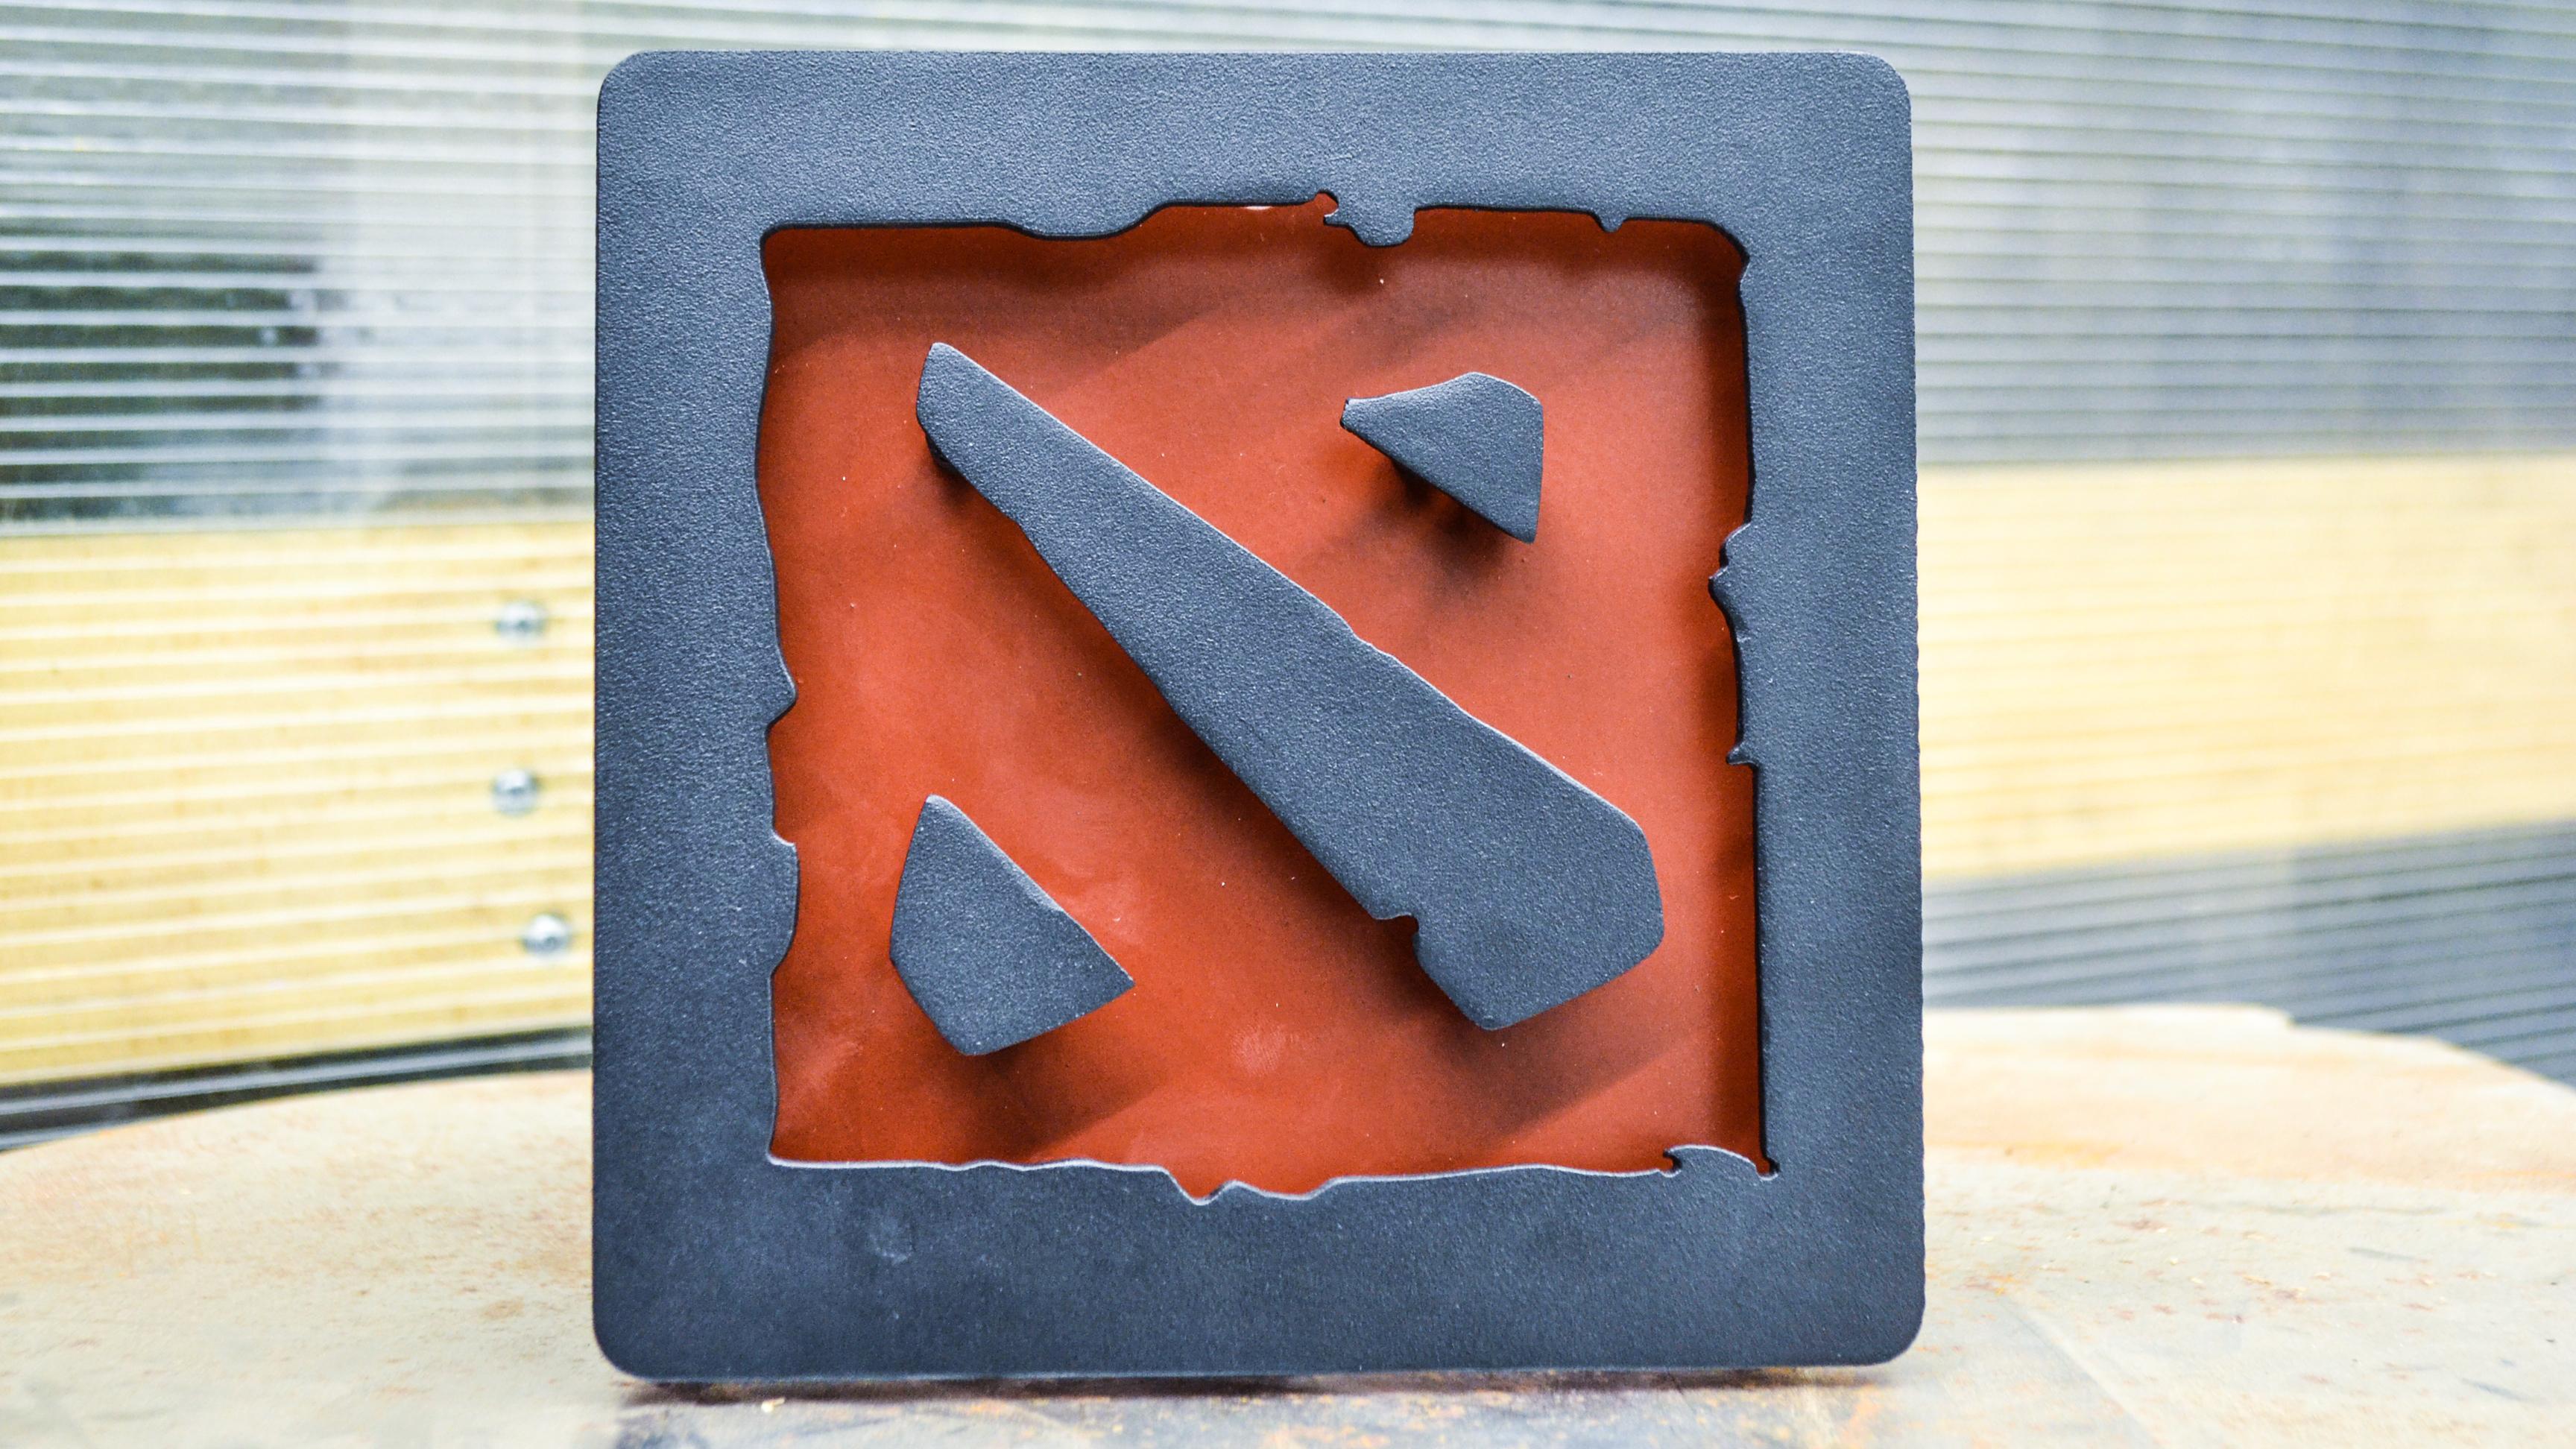 Merch Night Light Dota 2 Logo Red Emblem Lamp